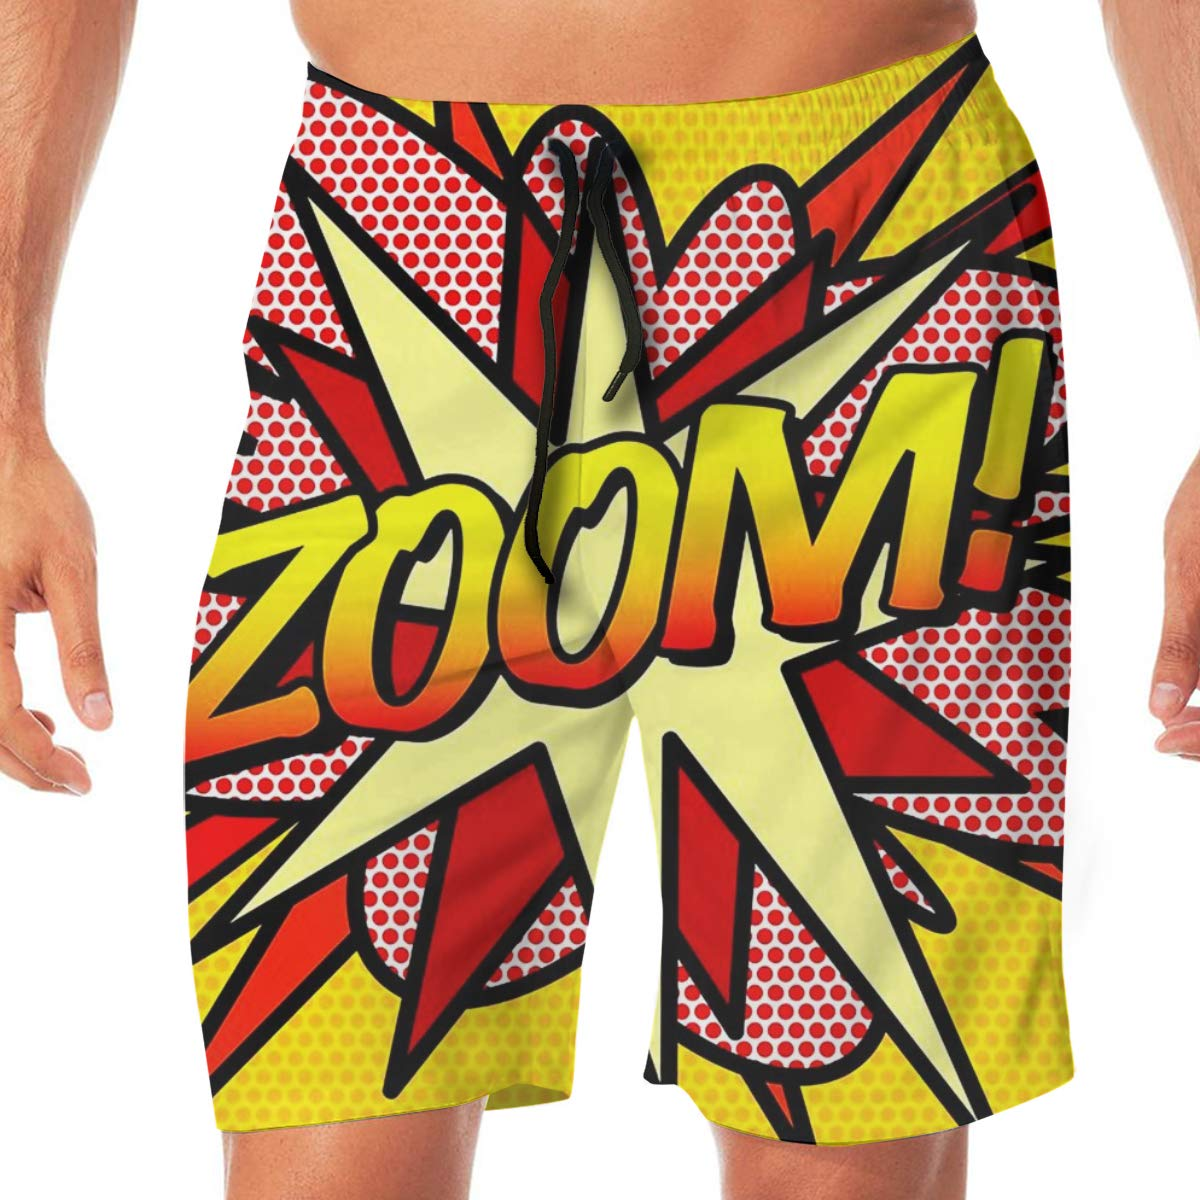 FUNSTYEET Mens Board Shorts Zoom Holiday Swim Trunks Mesh Lining